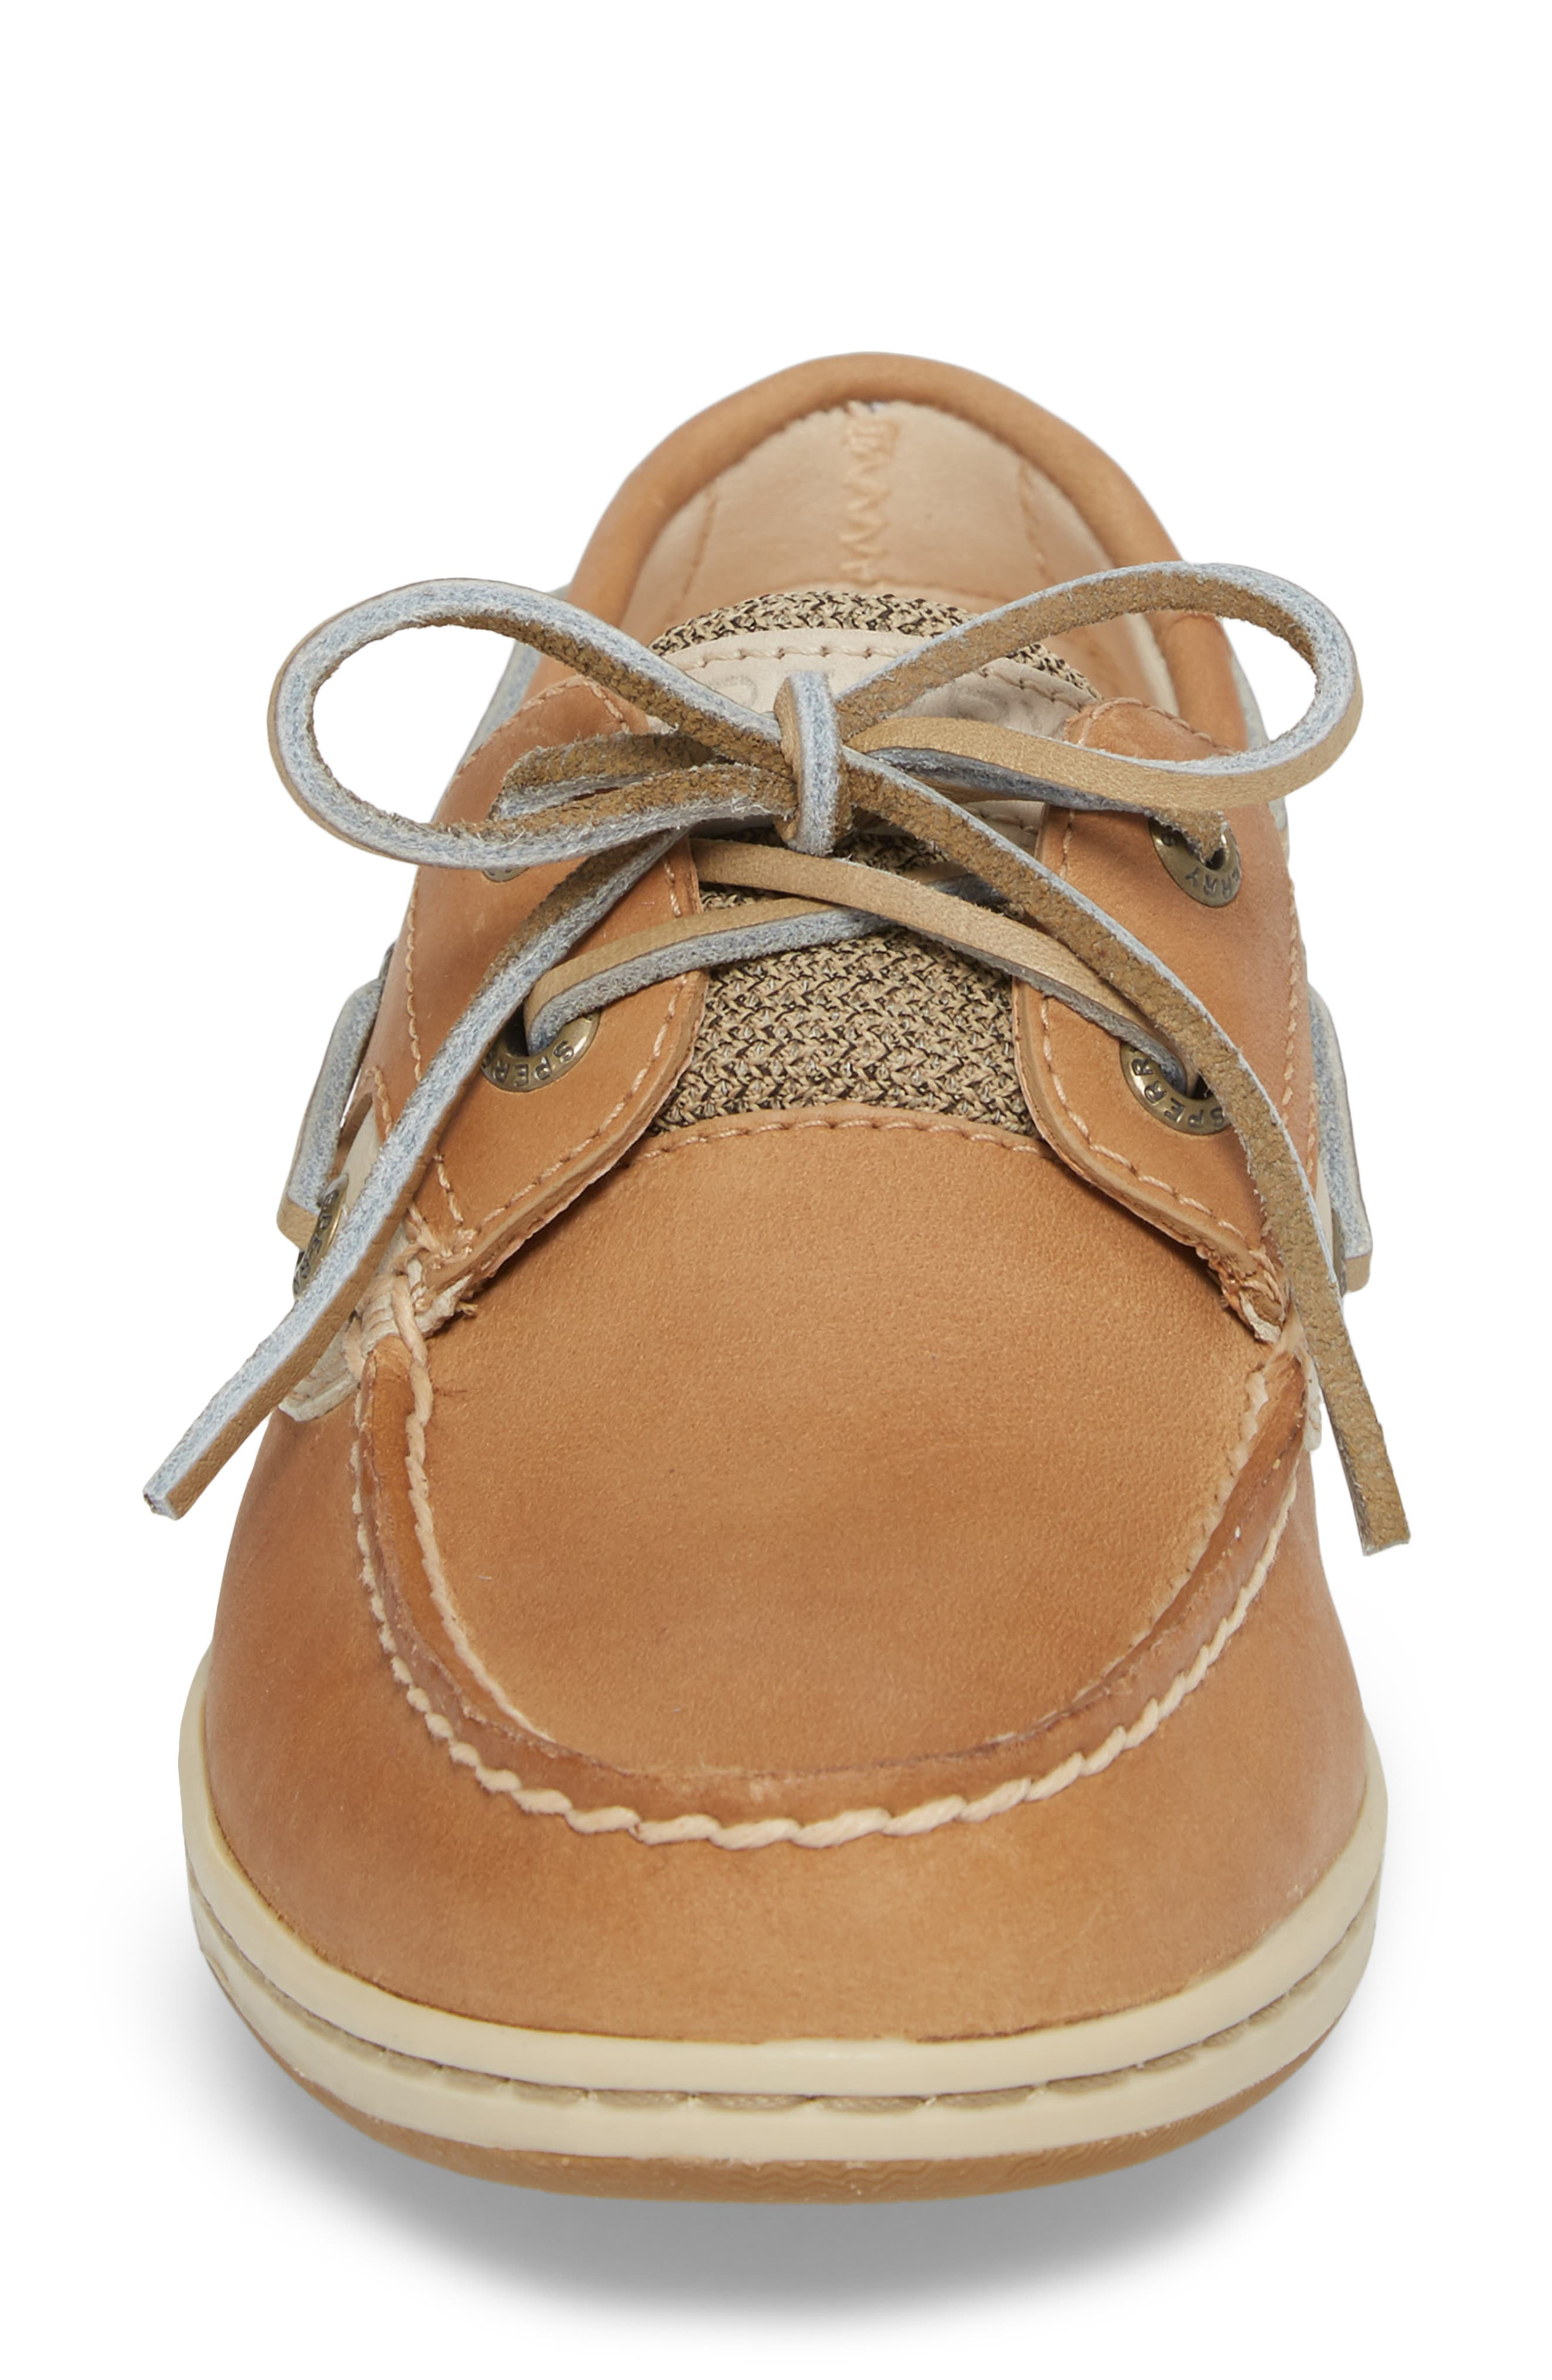 Top-Sider Koifish Loafer,                             Alternate thumbnail 4, color,                             Linen Oat Leather